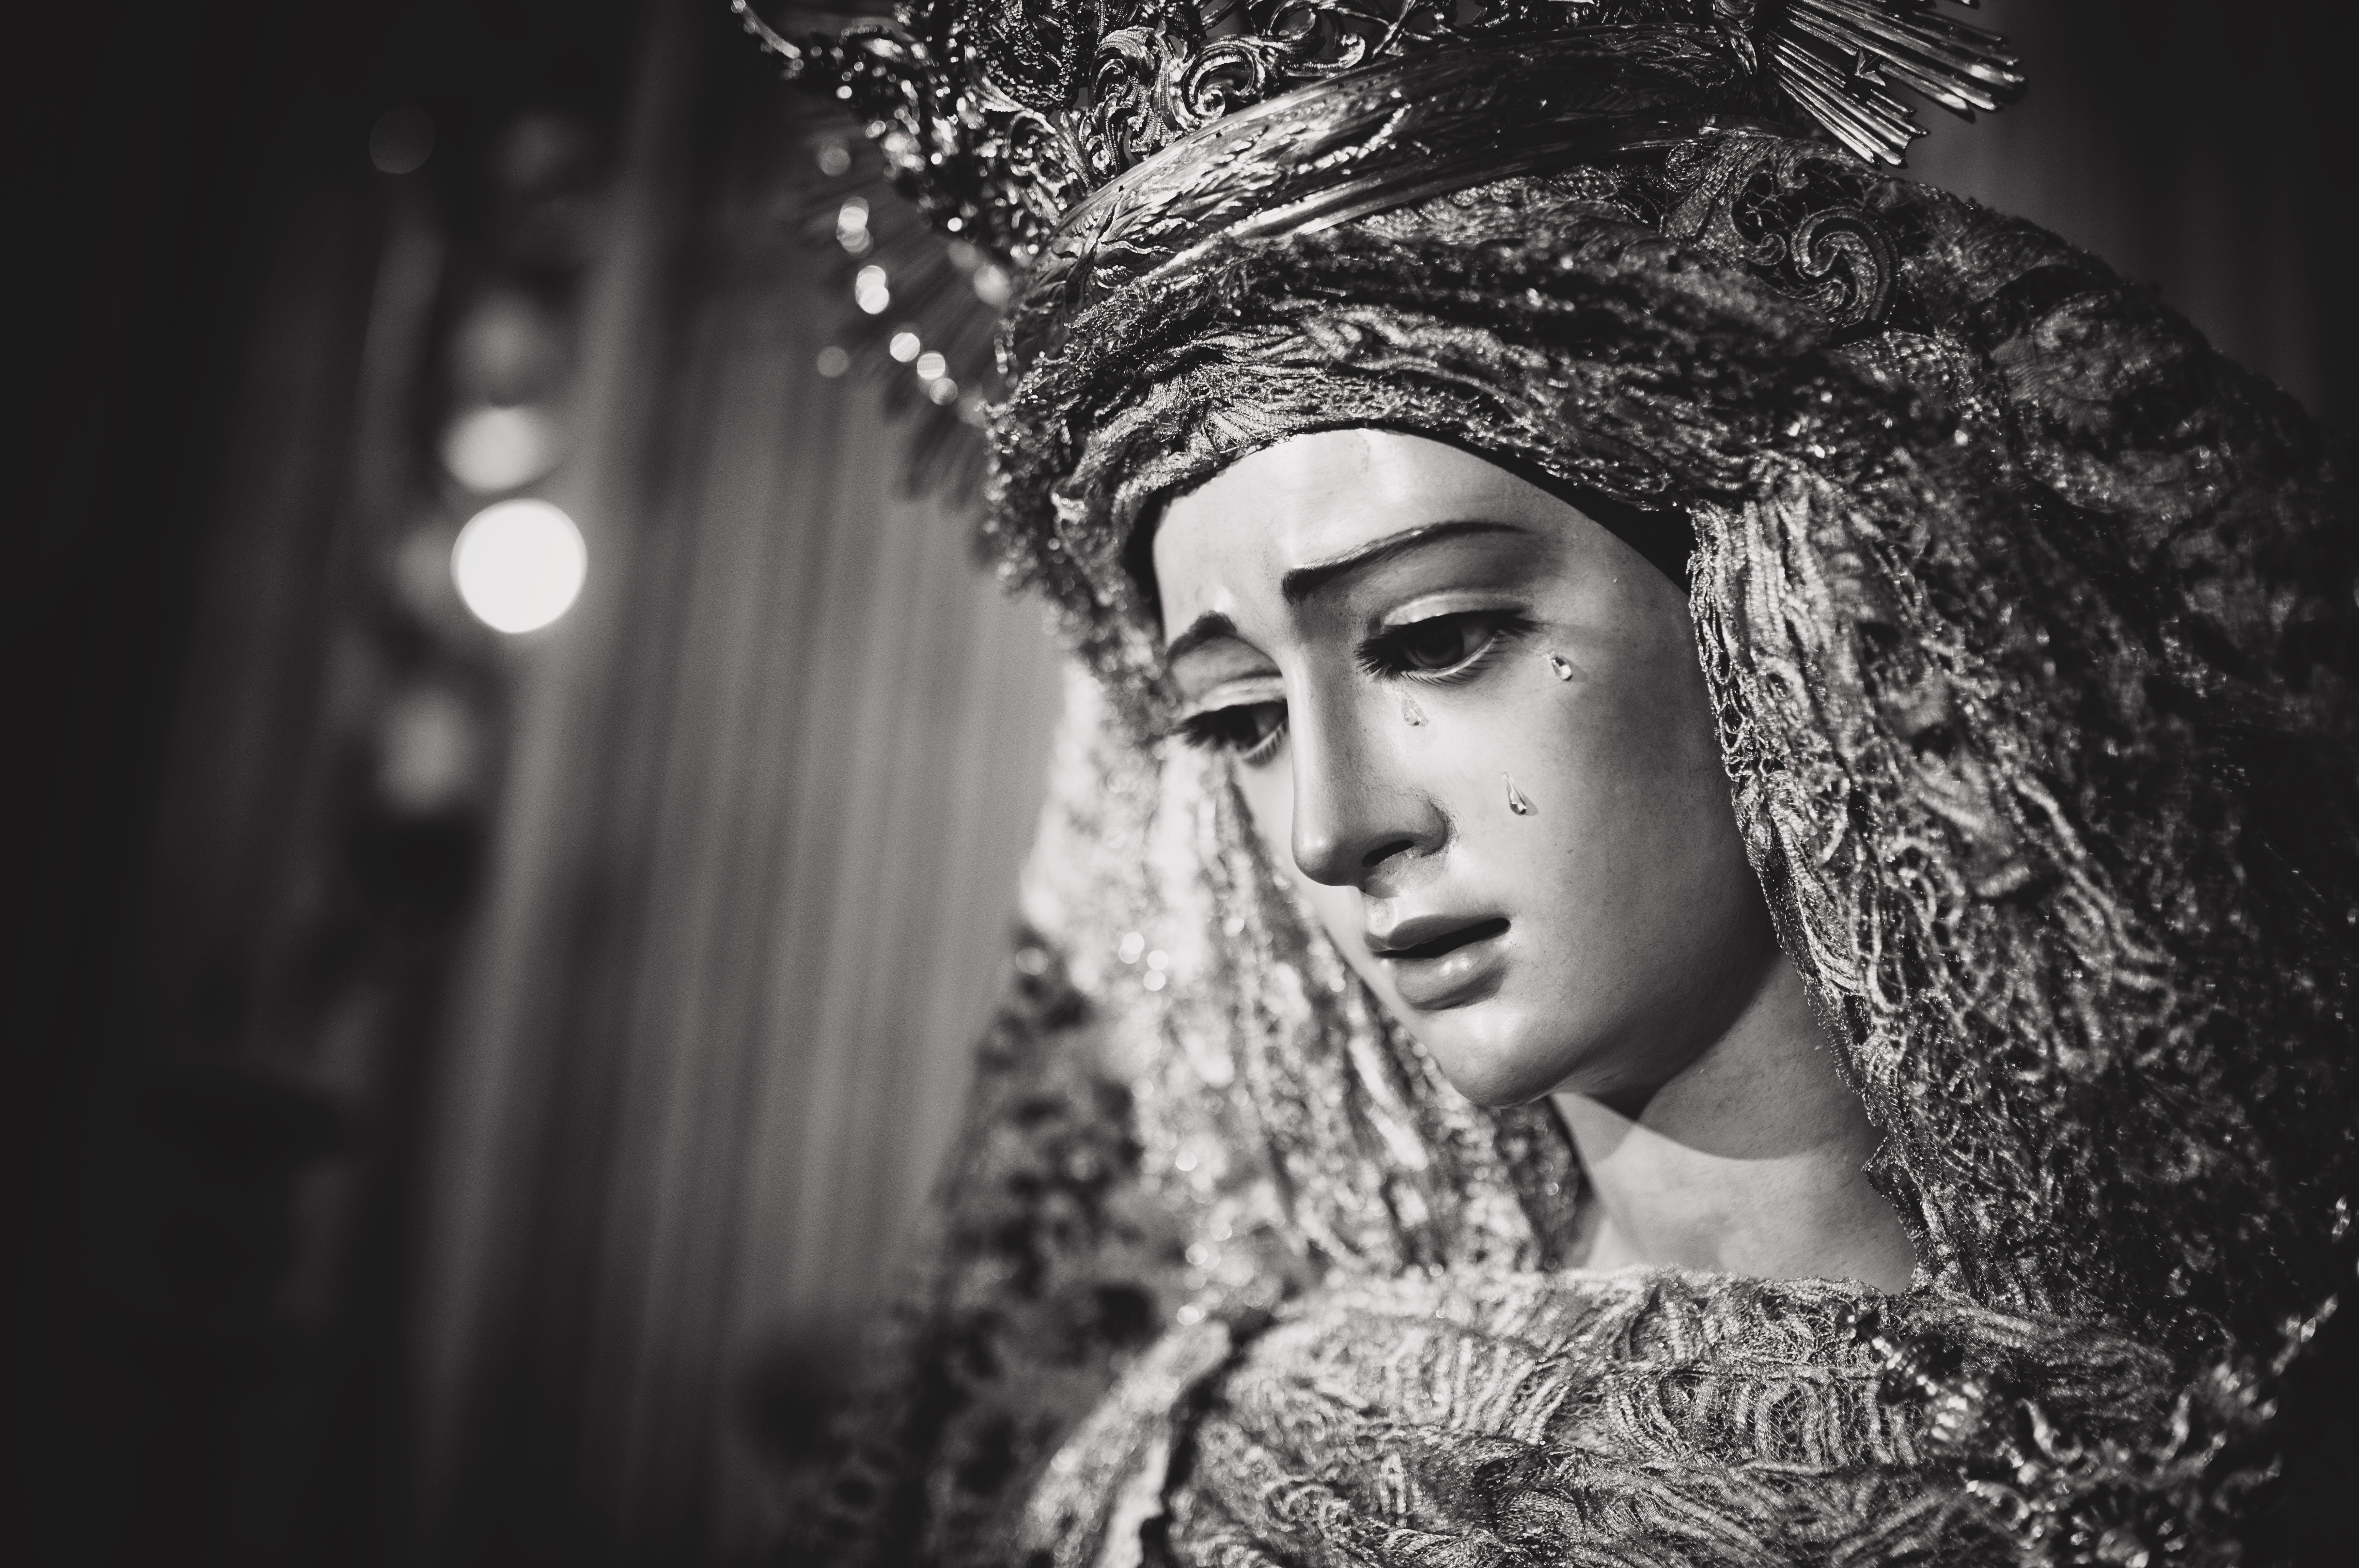 Monochrome Photo of Religious Statue